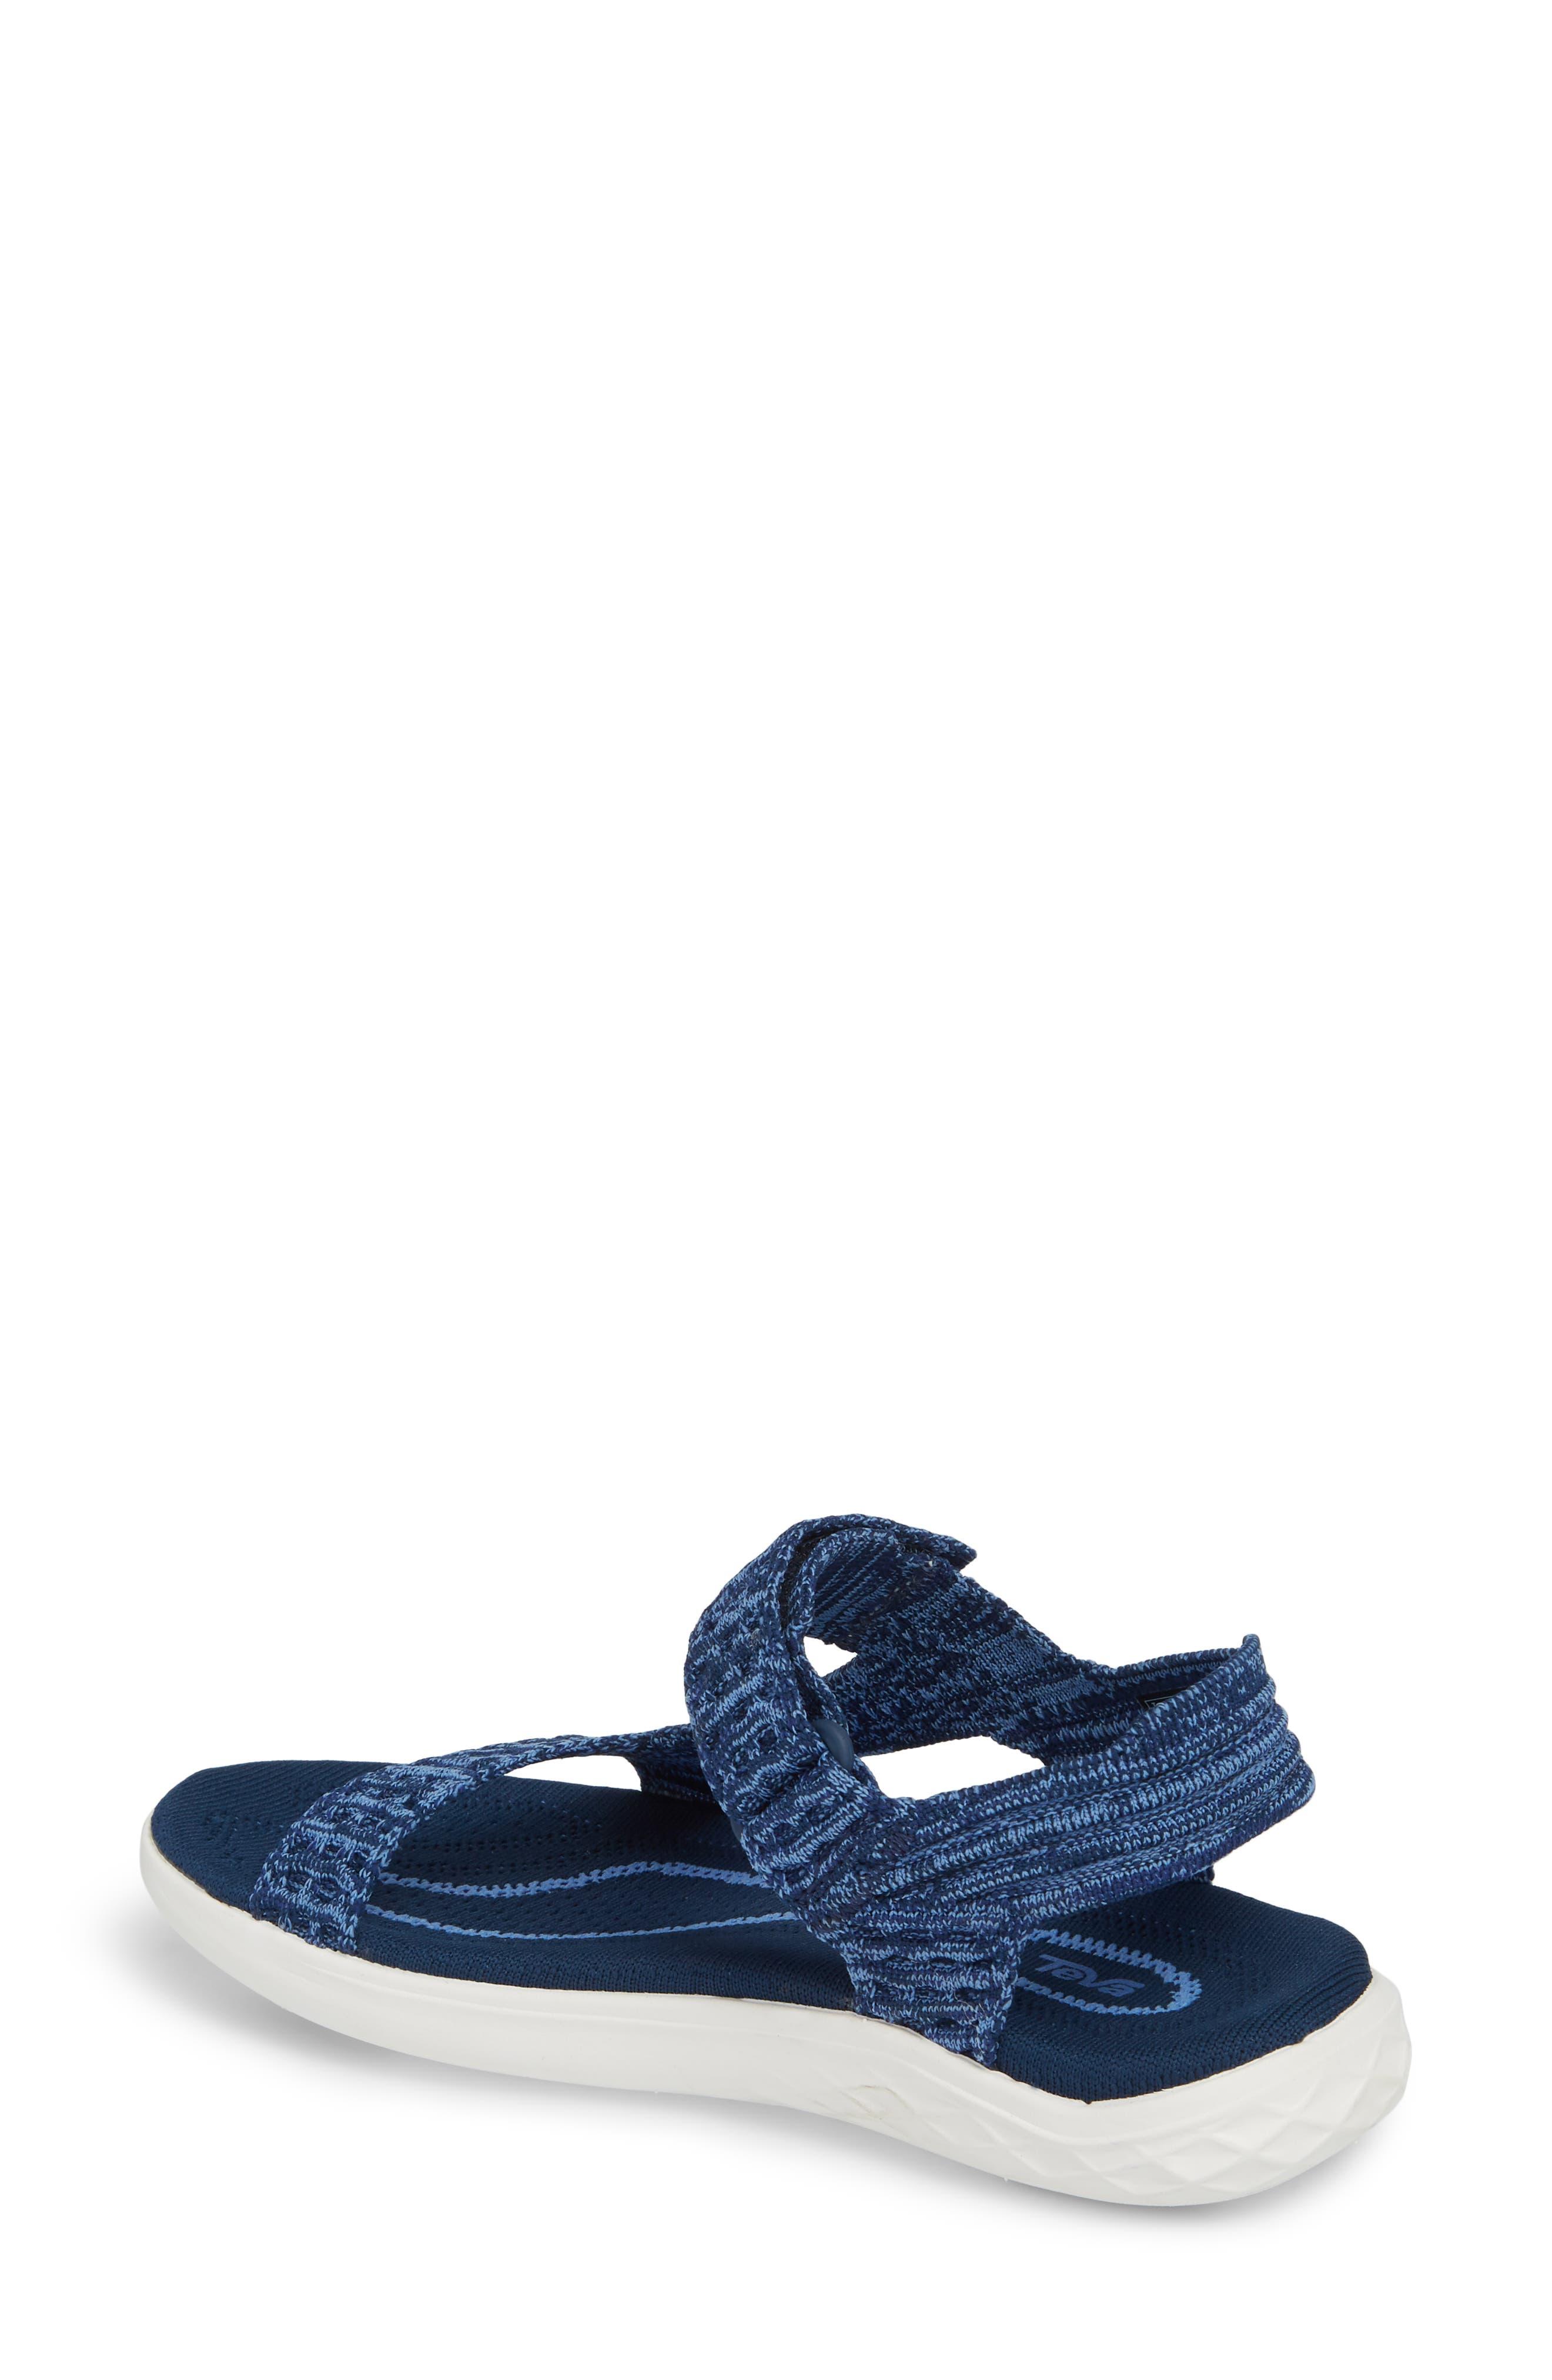 Terra Float 2 Knit Universal Sandal,                             Alternate thumbnail 8, color,